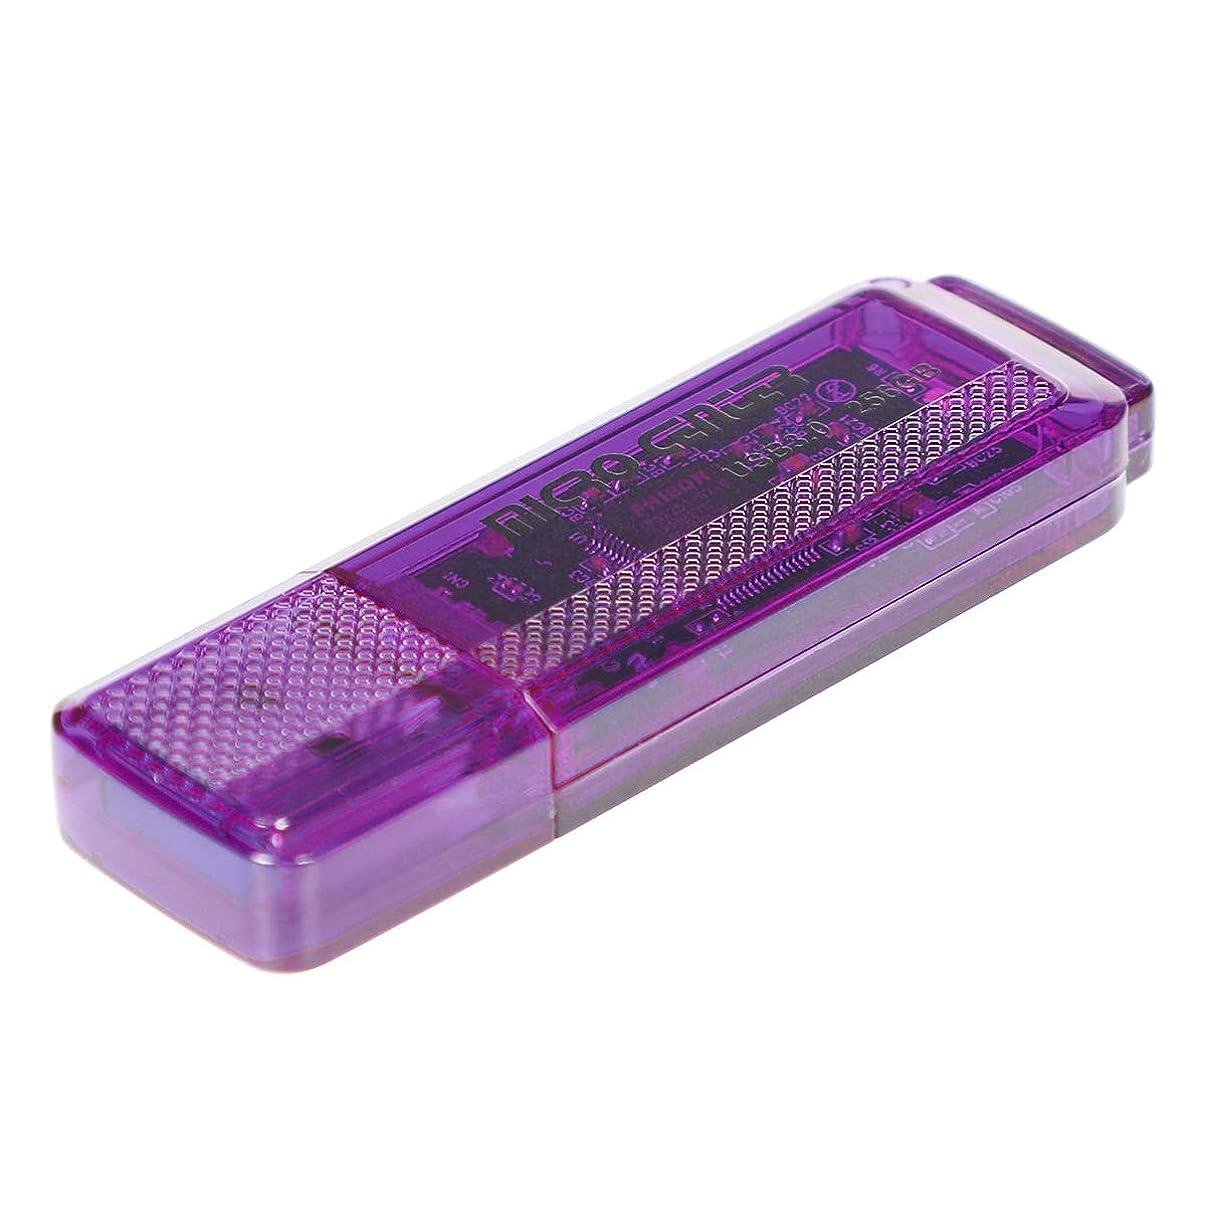 Micro Center SuperSpeed 256GB USB 3.0 Flash Drive Gum Size Memory Stick Thumb Drive Data Storage Jump Drive (256G)